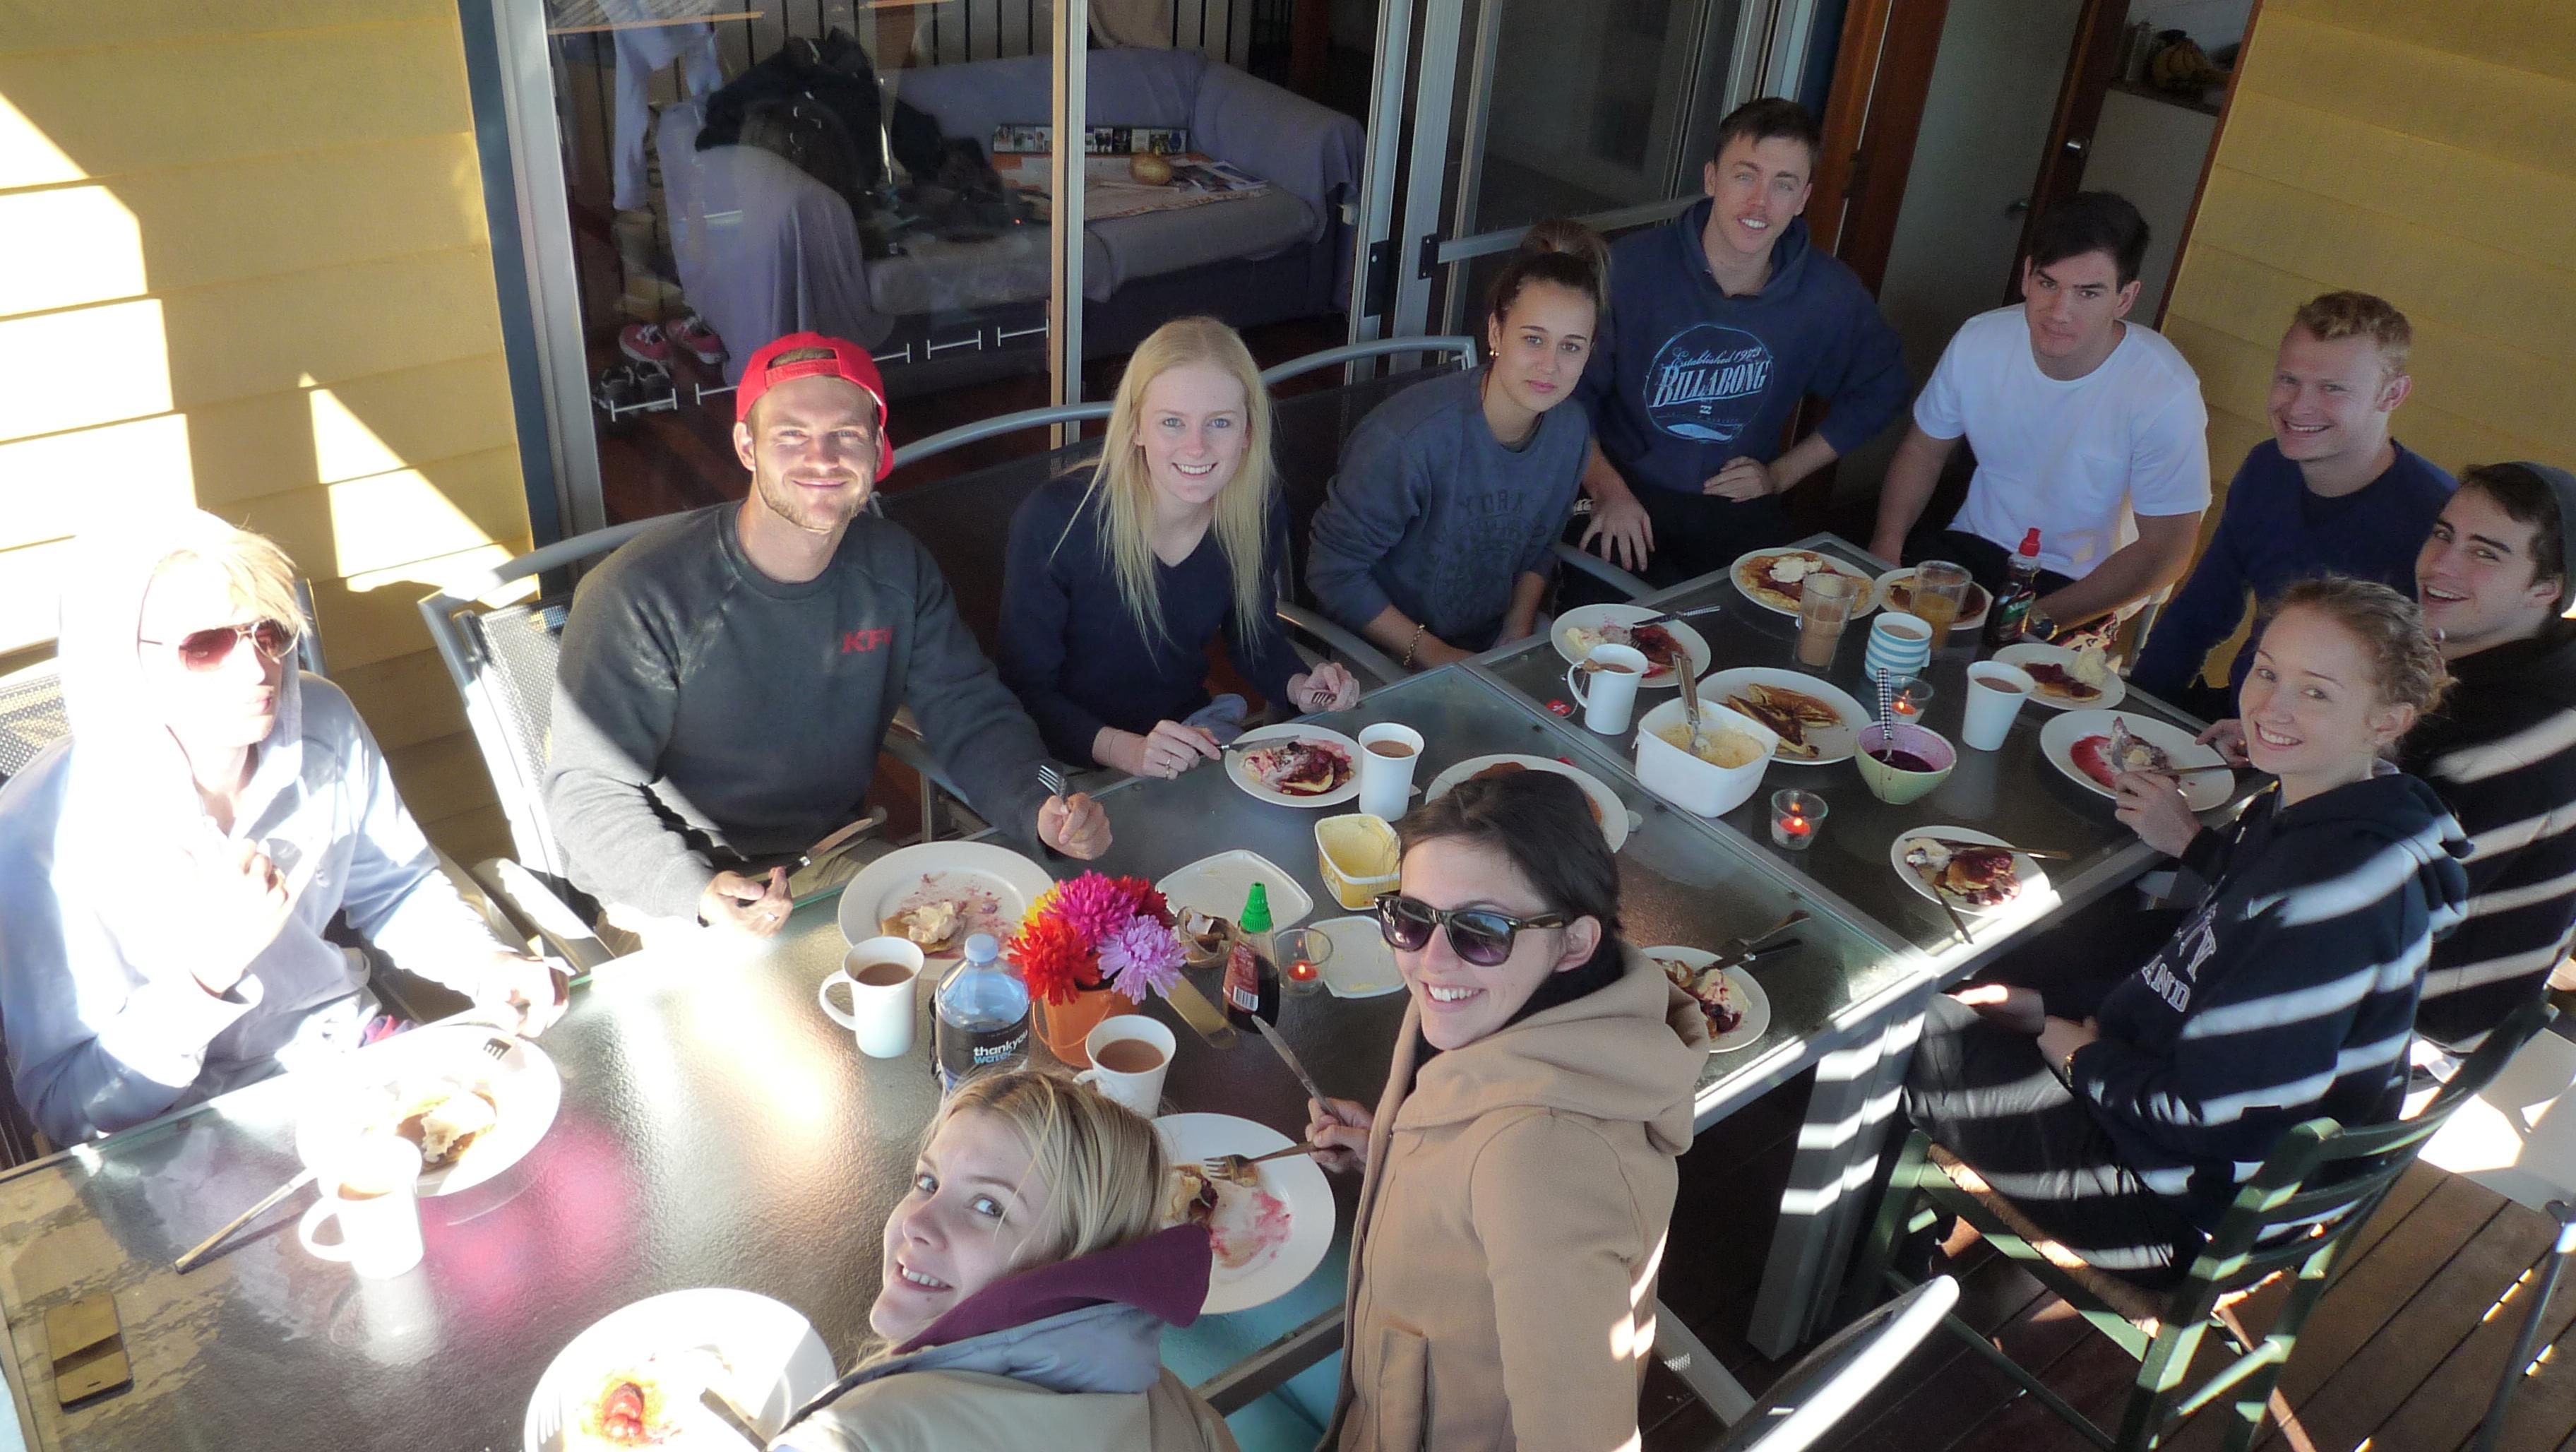 Pancake Sunday at Fifth Ave.